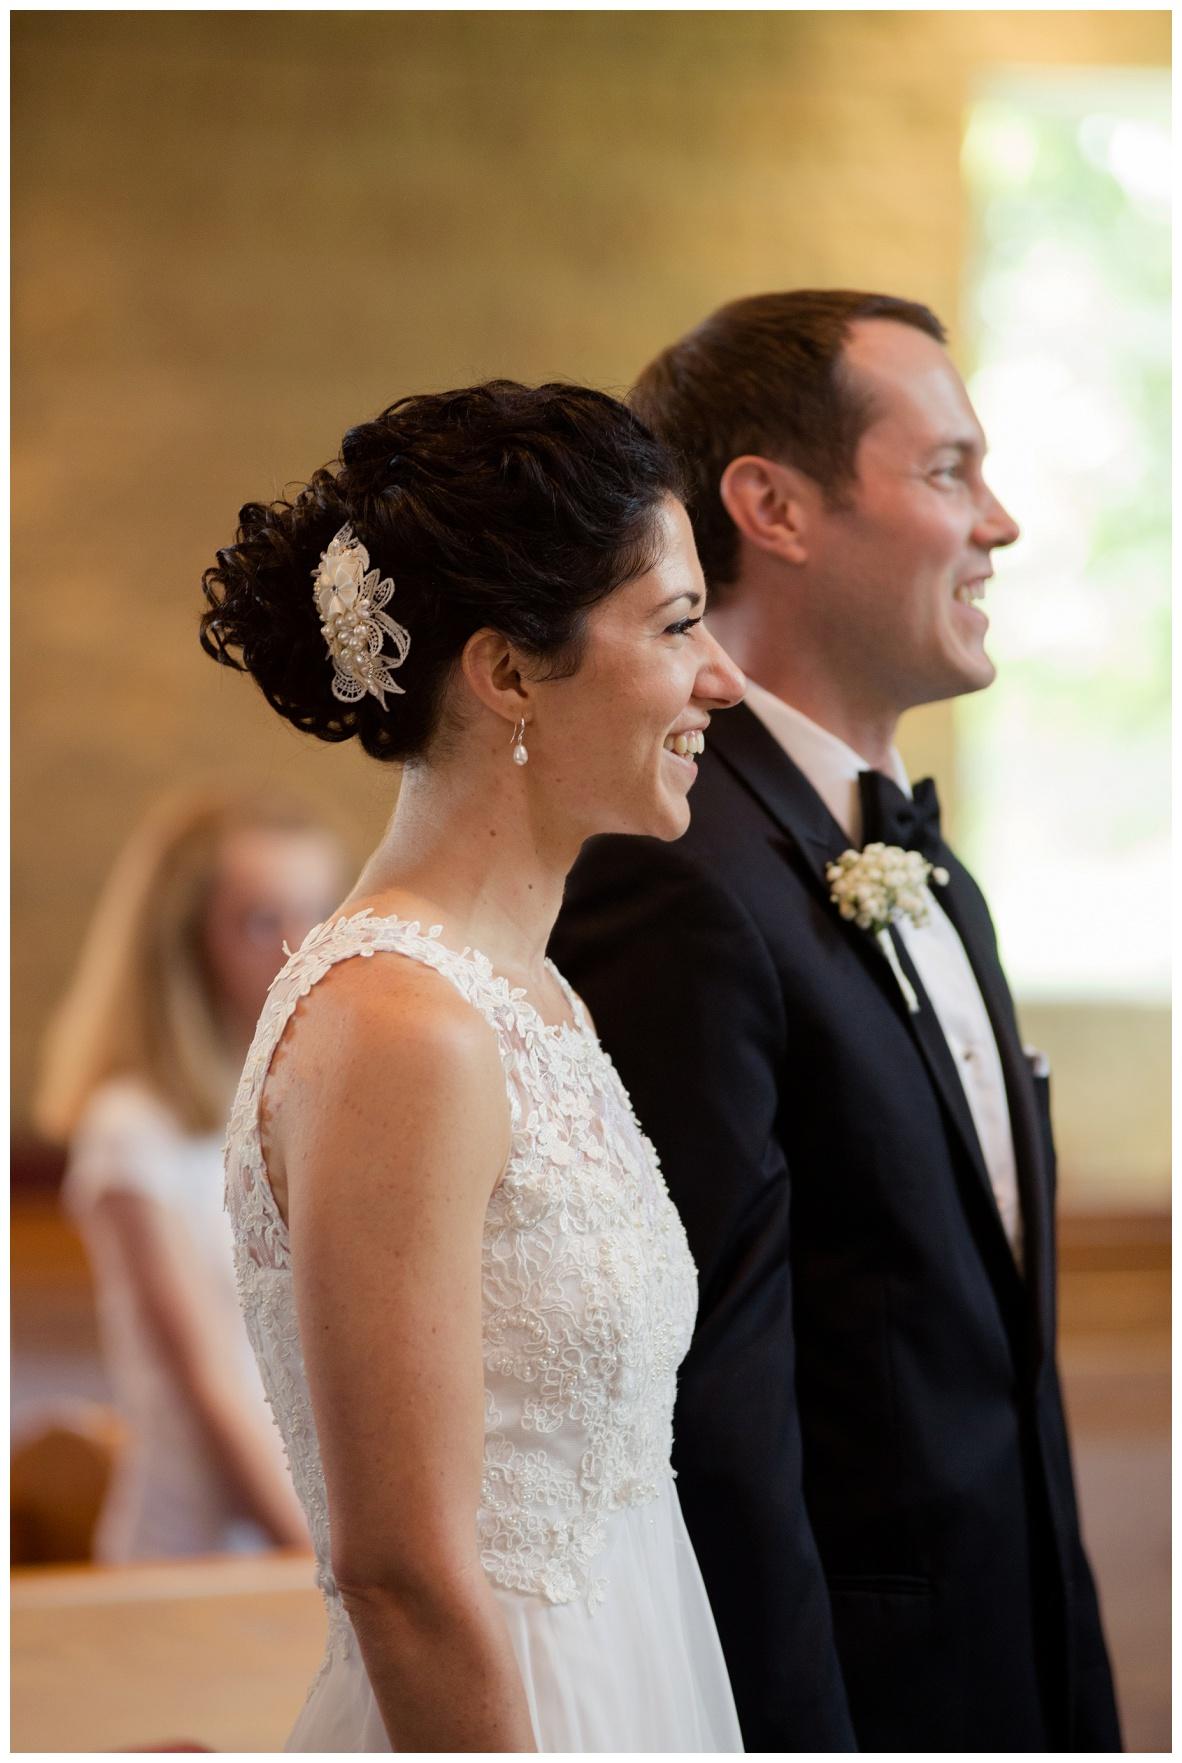 The Wedding of Danielle and Matt_0032.jpg